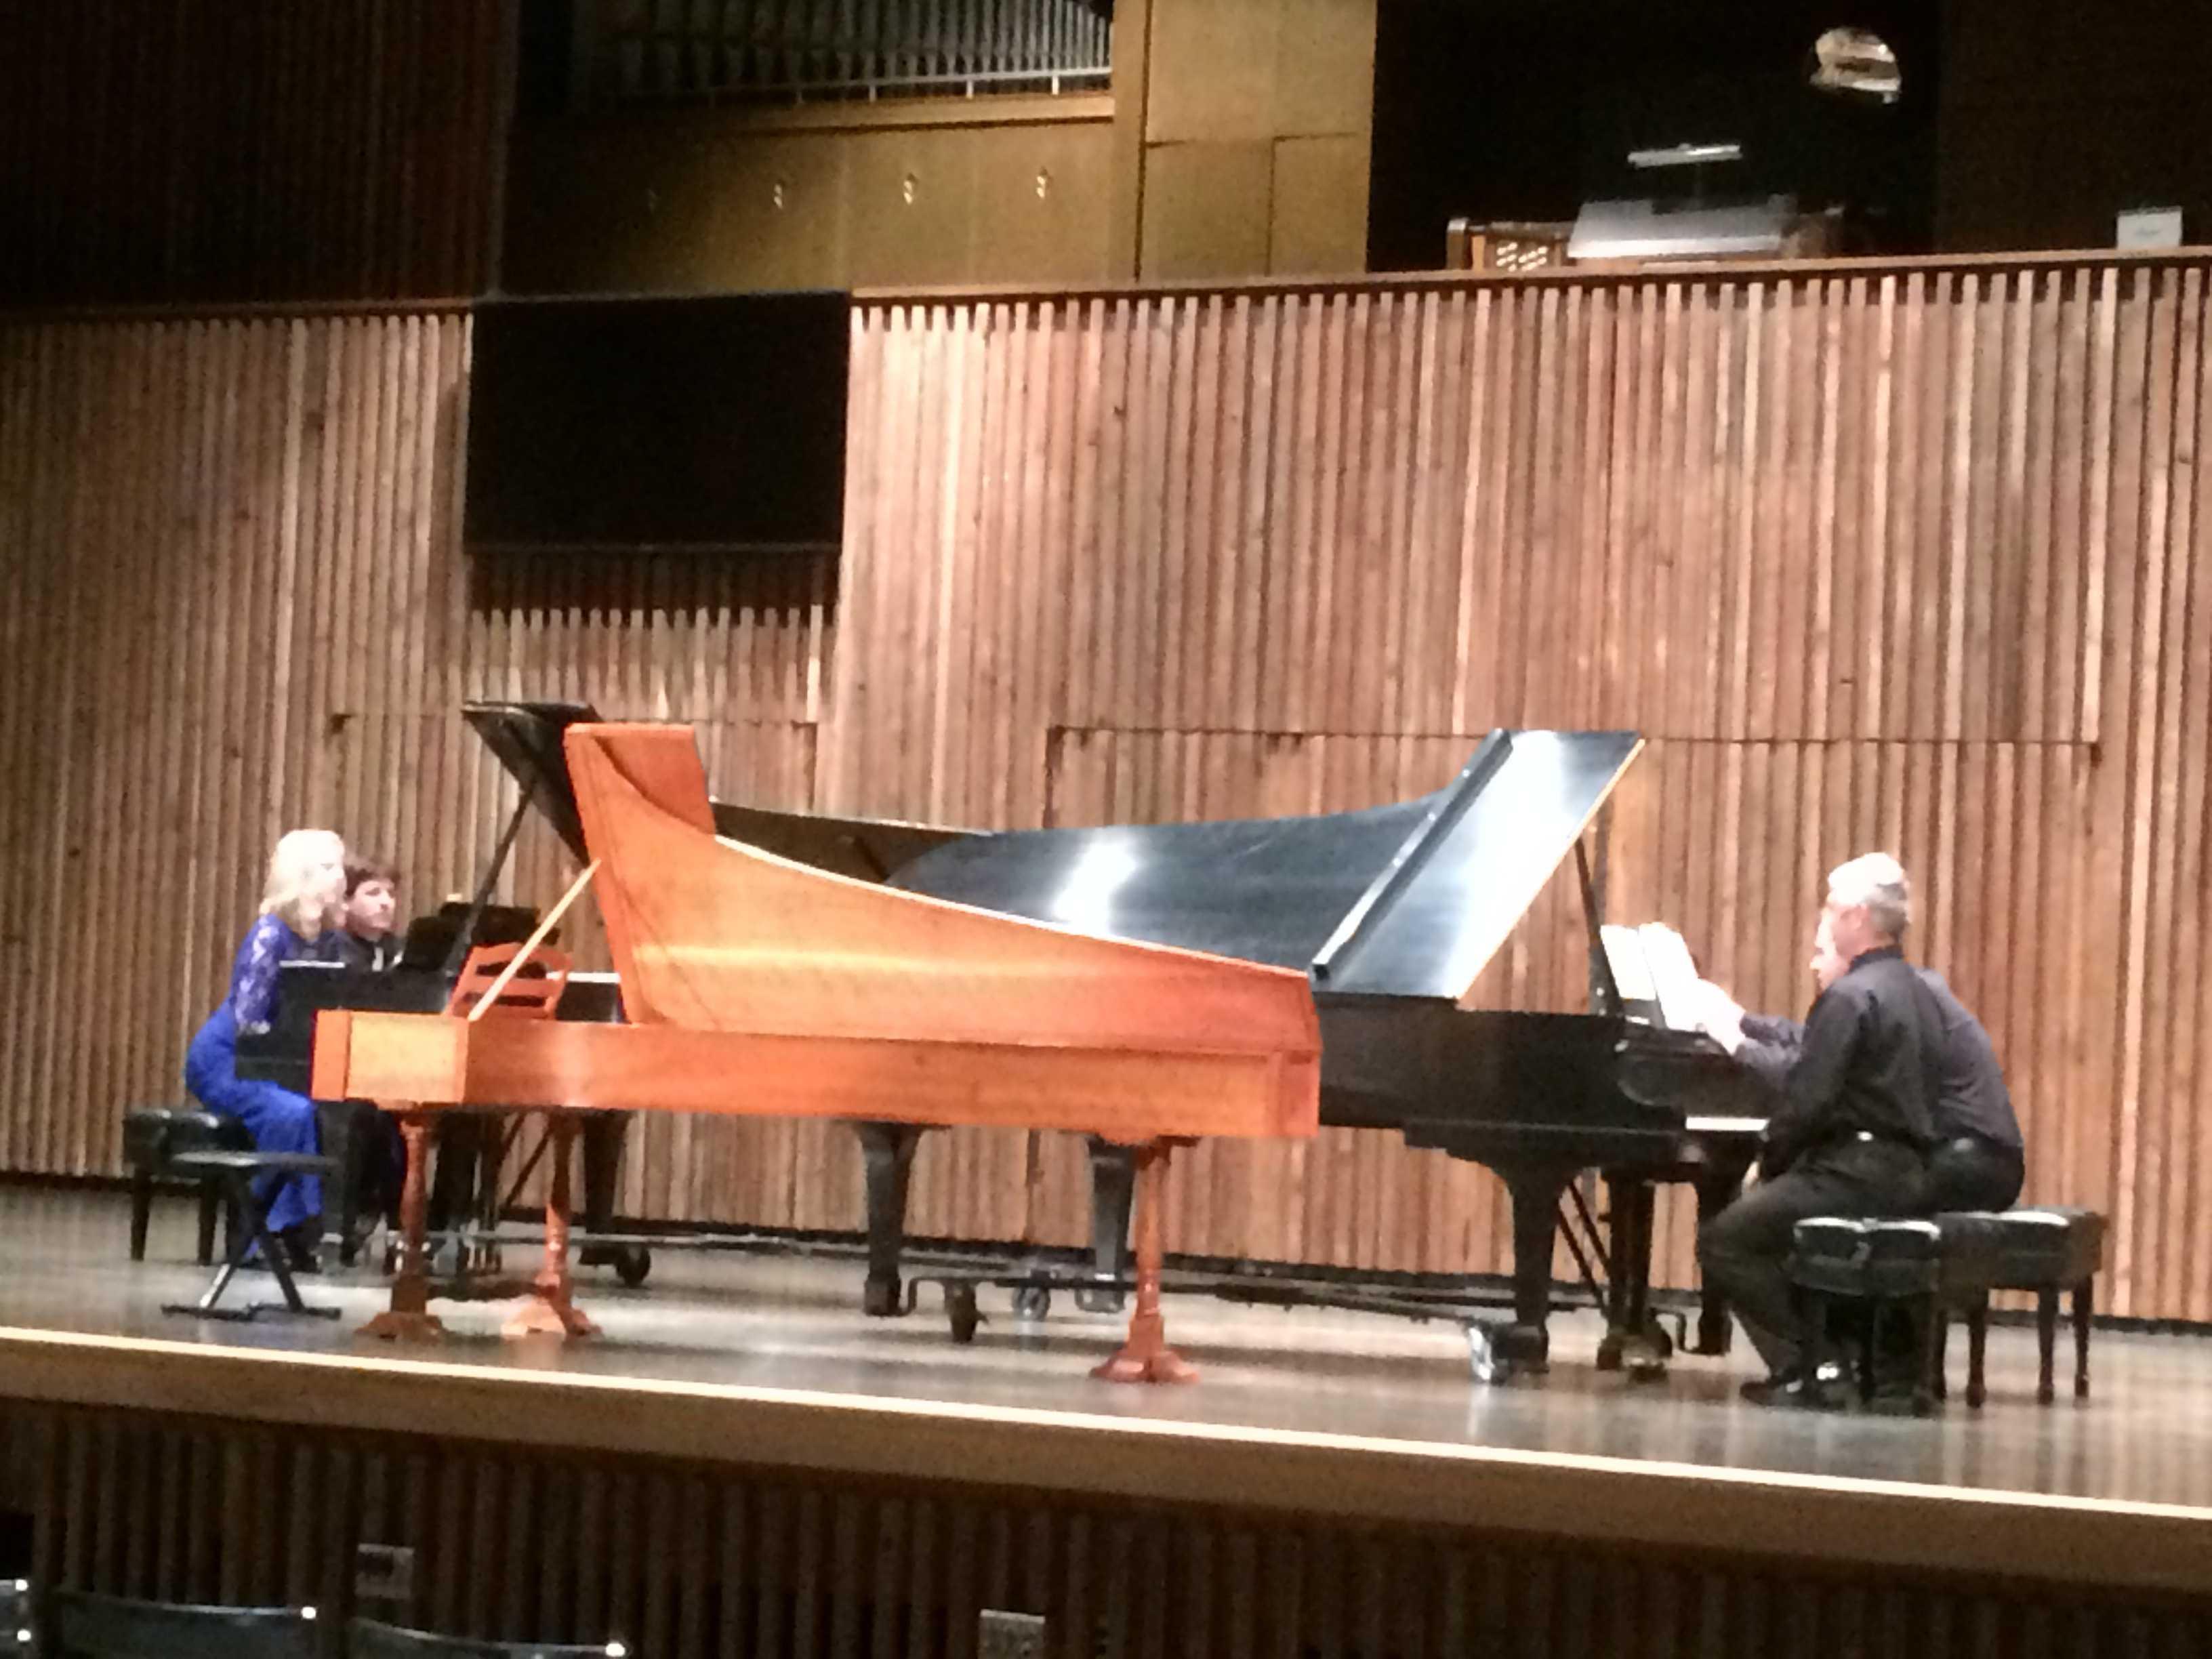 Oltmanns, Wilding, Reinhuber and Metchkov perform together at the UA/YSU Keyboard Festival.